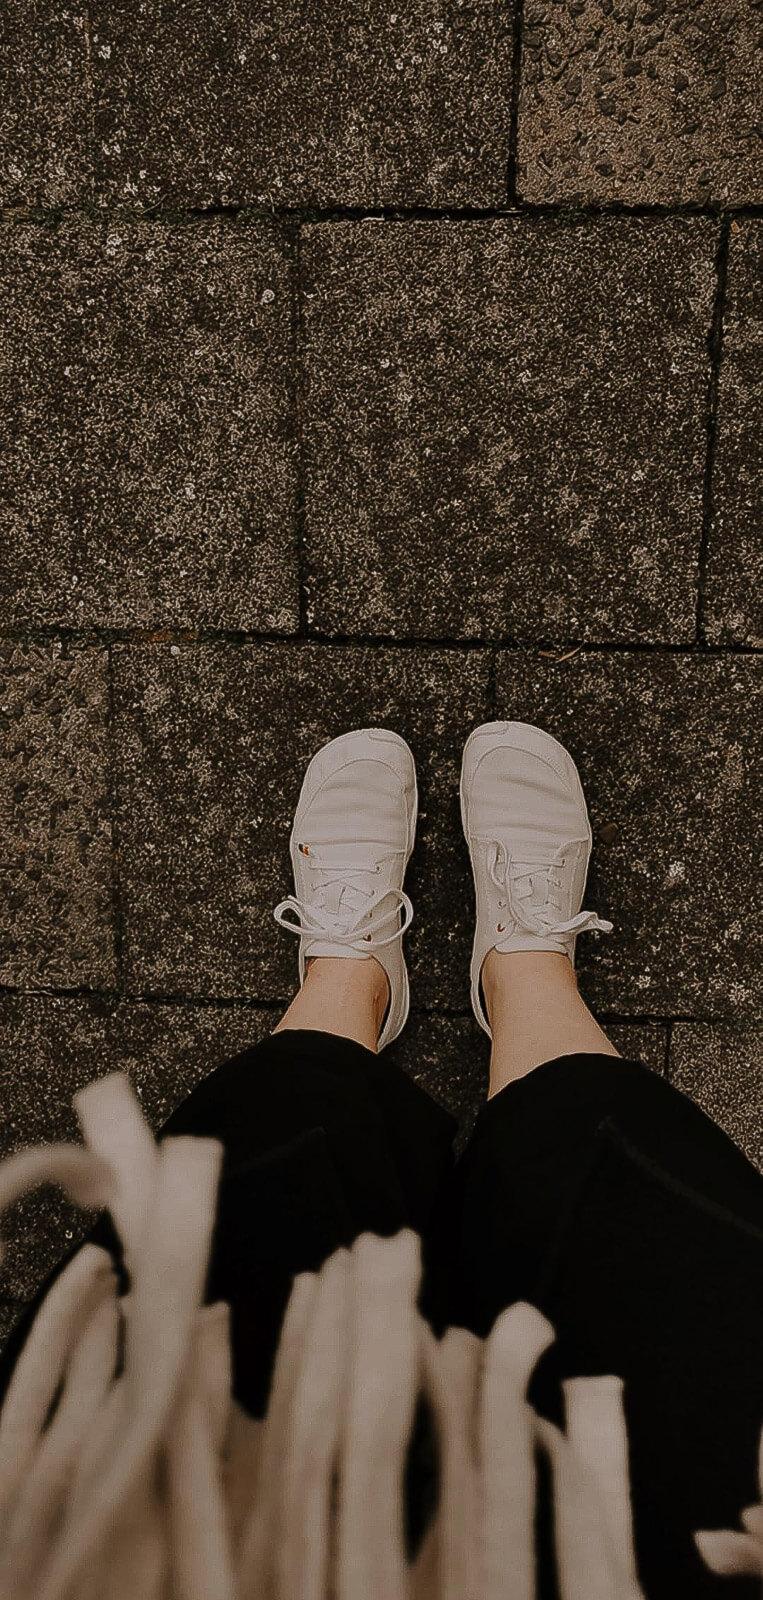 Wildling, Wildling Shoes, Wildlinge im Test, Wildling Schuhe Erfahrungsbericht, Wildling Erfahrungsbericht, Minimalschuhe, Minimalschuhe Erfahrungsbericht, Minimalschuhe Test